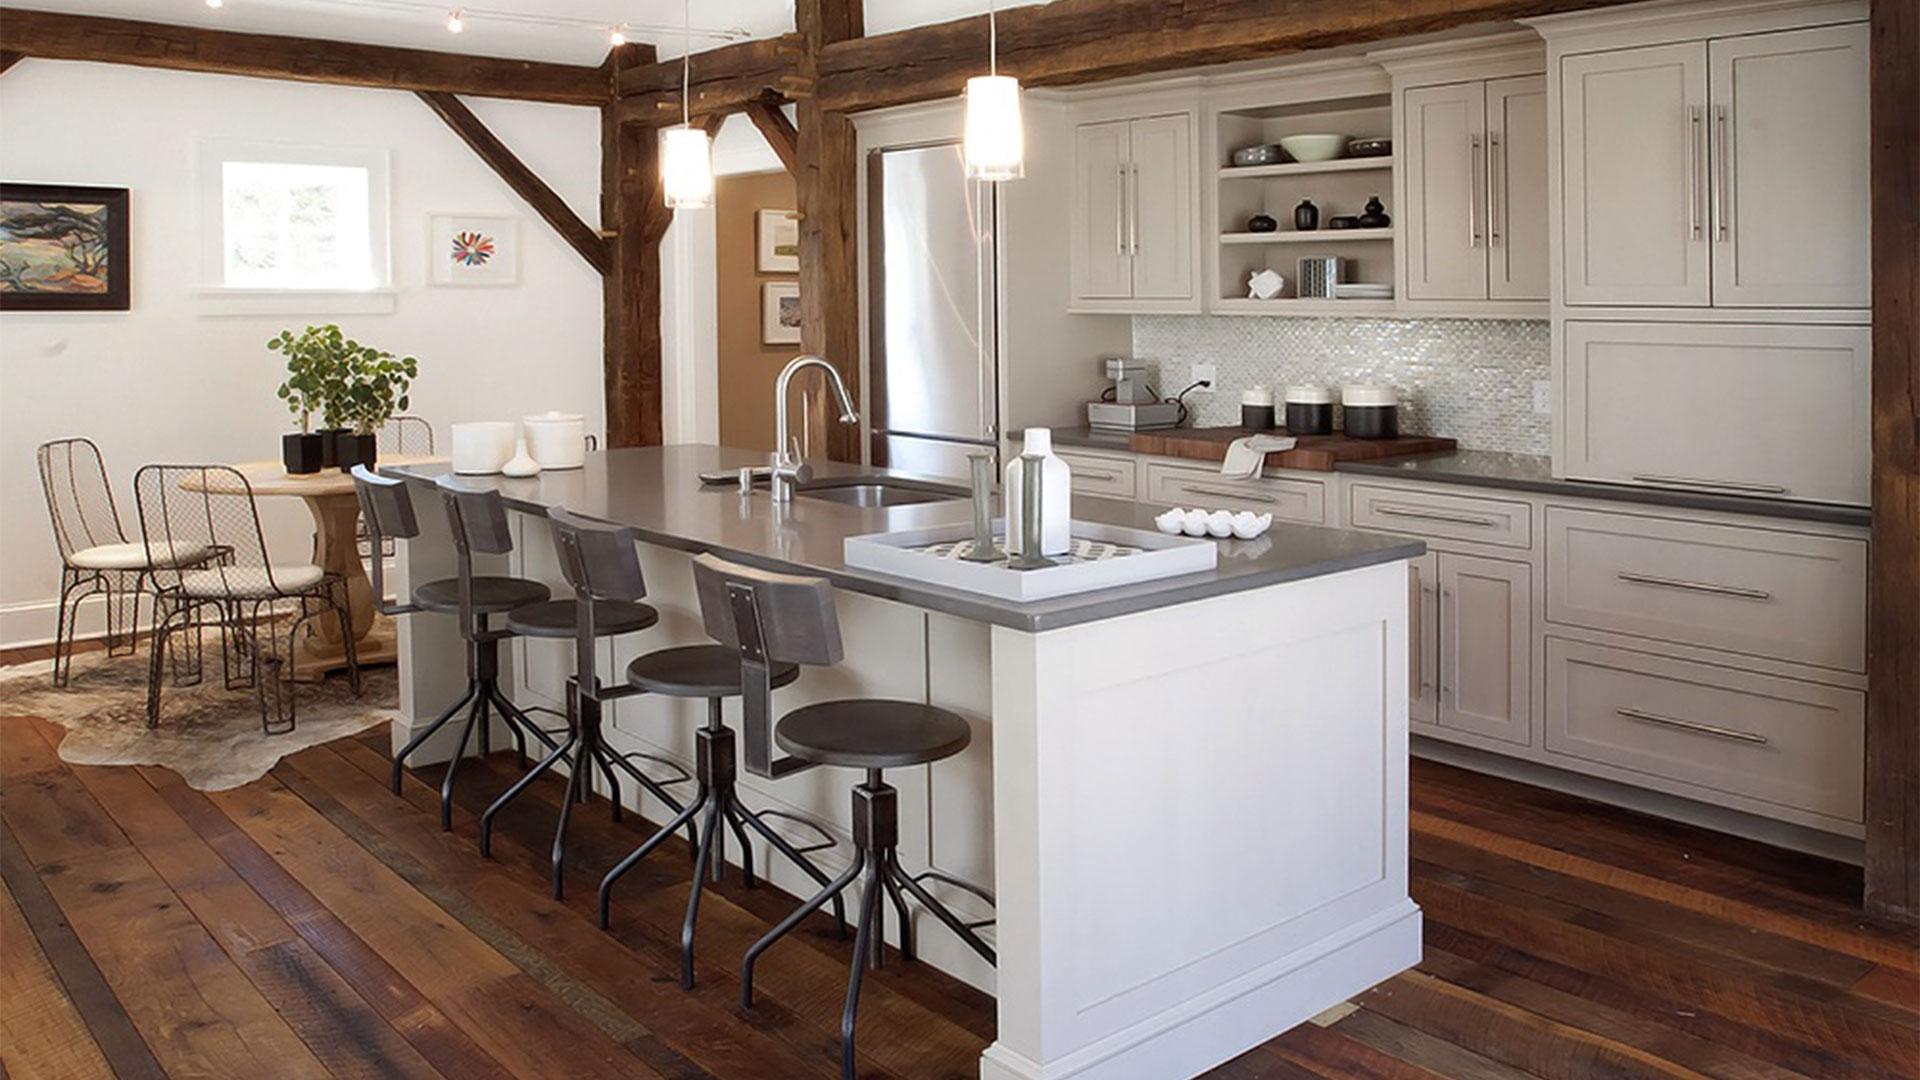 Leuke Keuken Ideeen.Leuke Keukens Referenties Op Huis Ontwerp Interieur Decoratie En